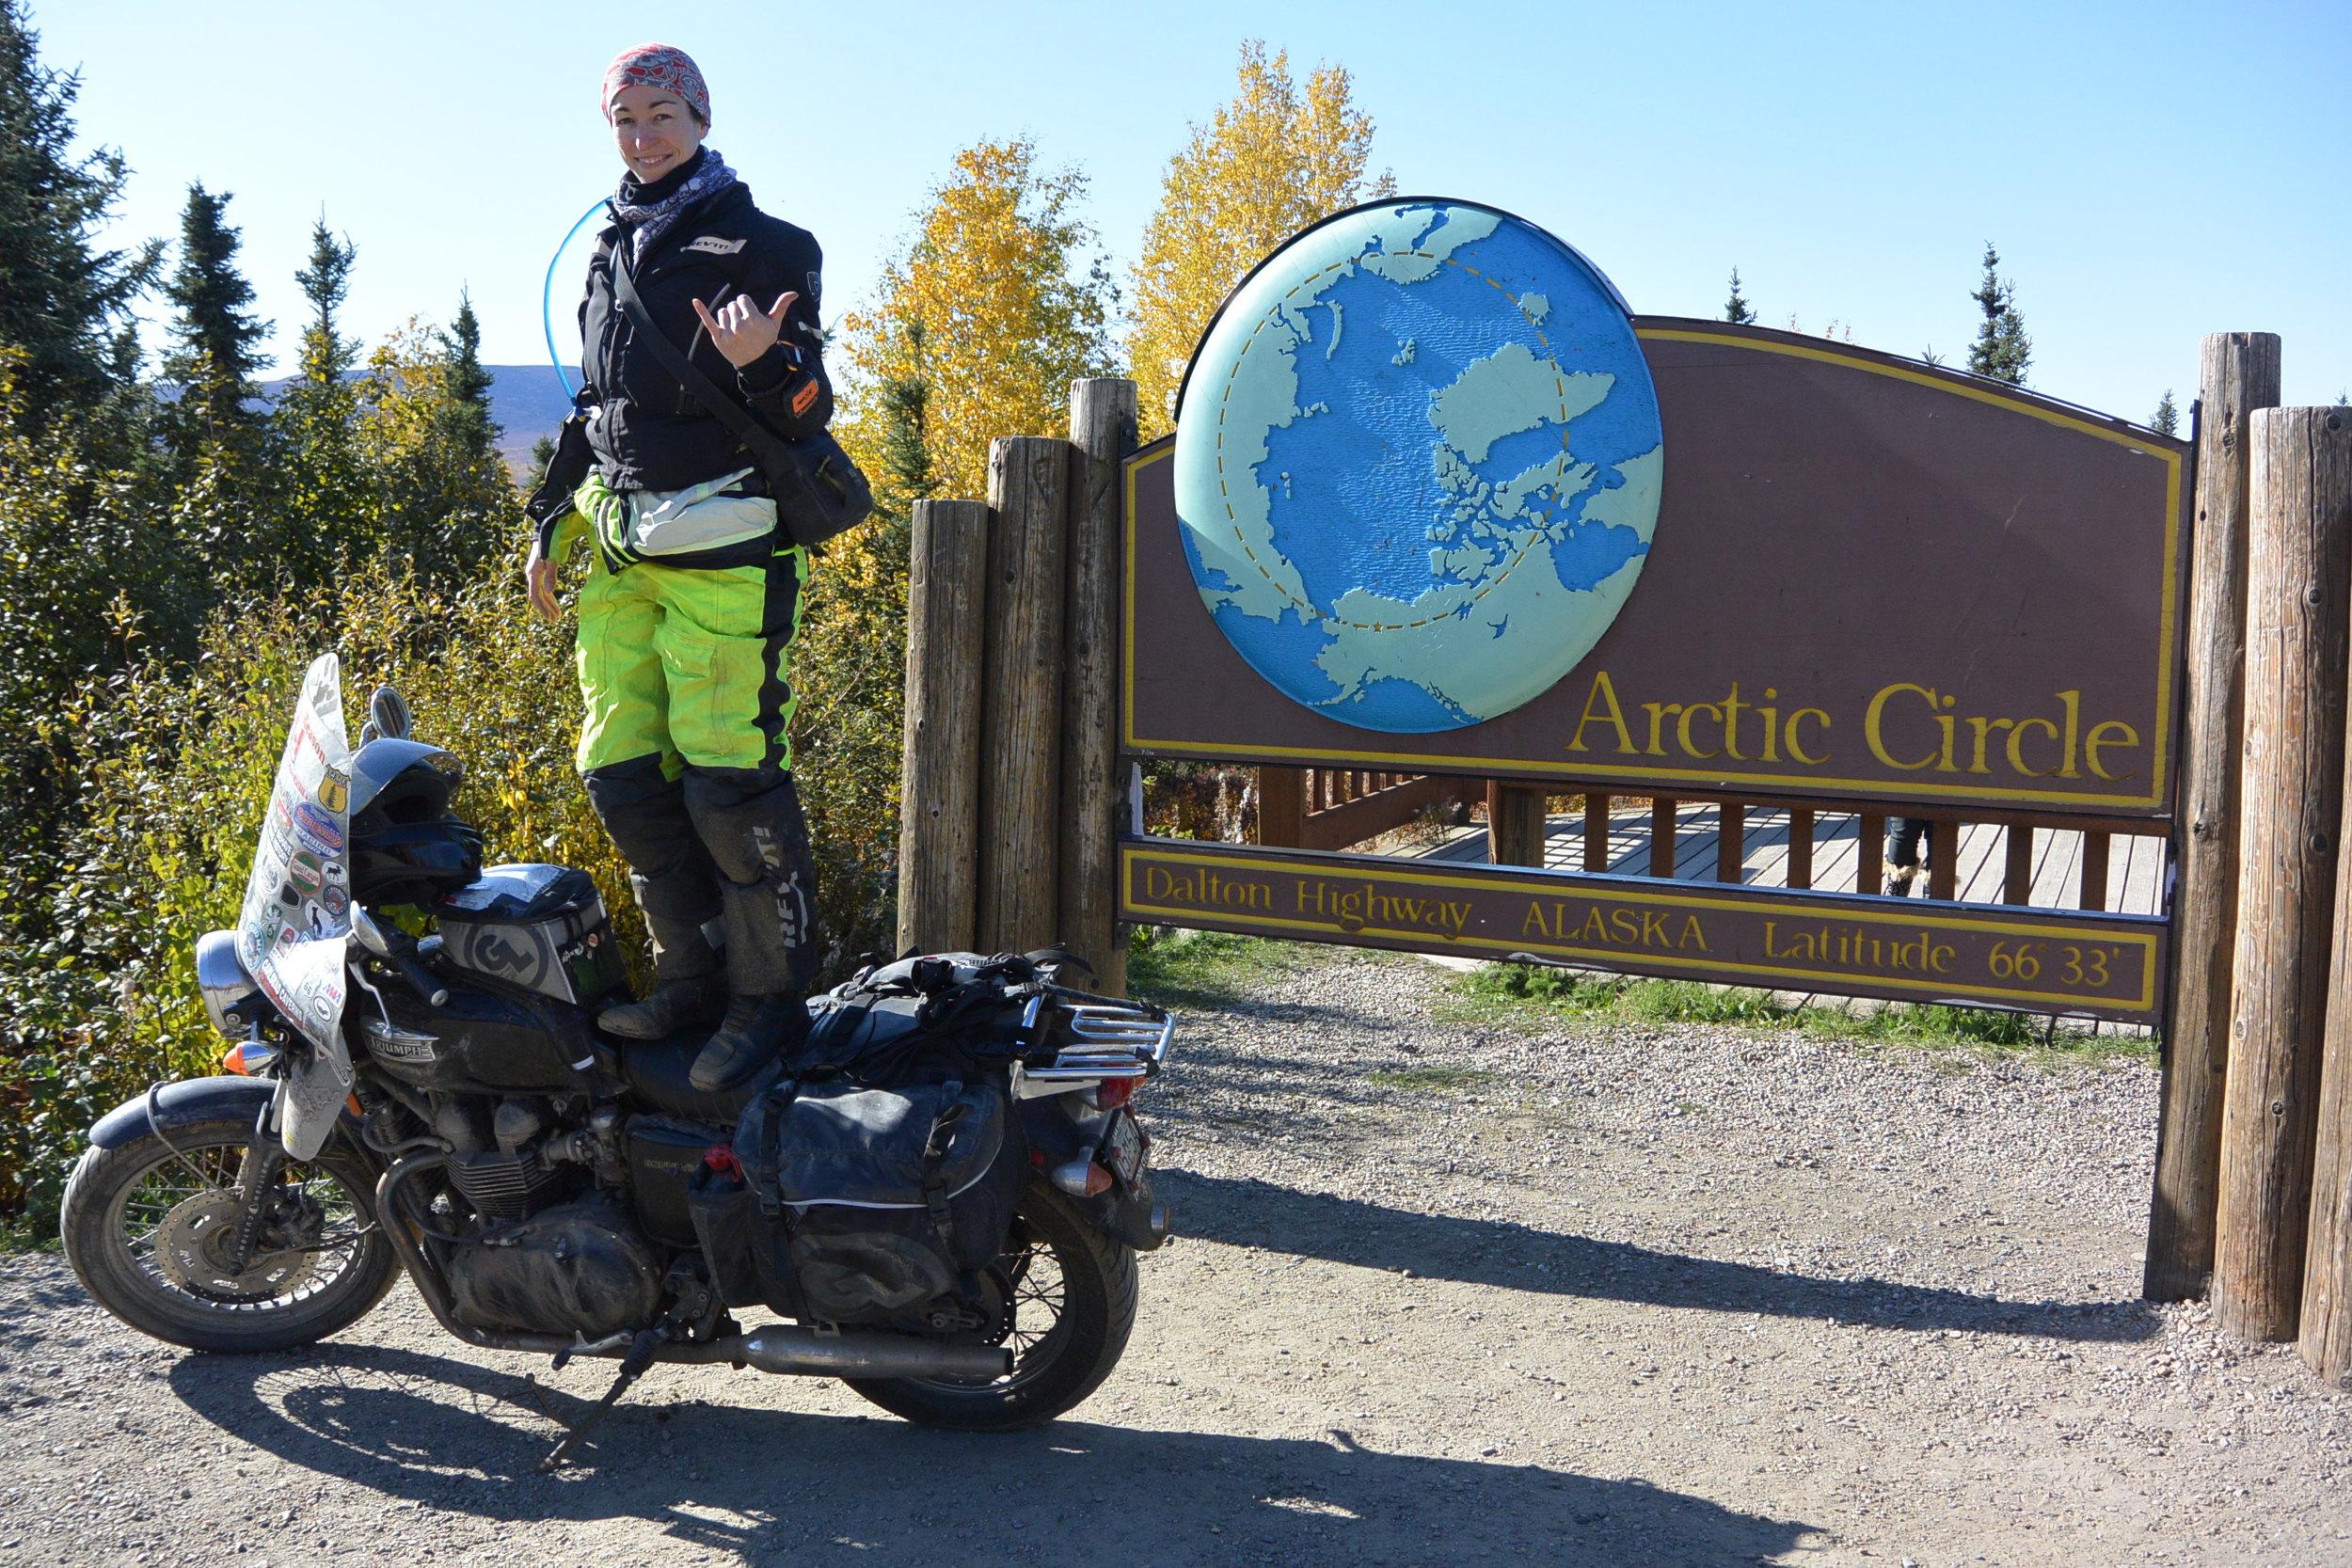 ArcticCircleAlaska.jpg